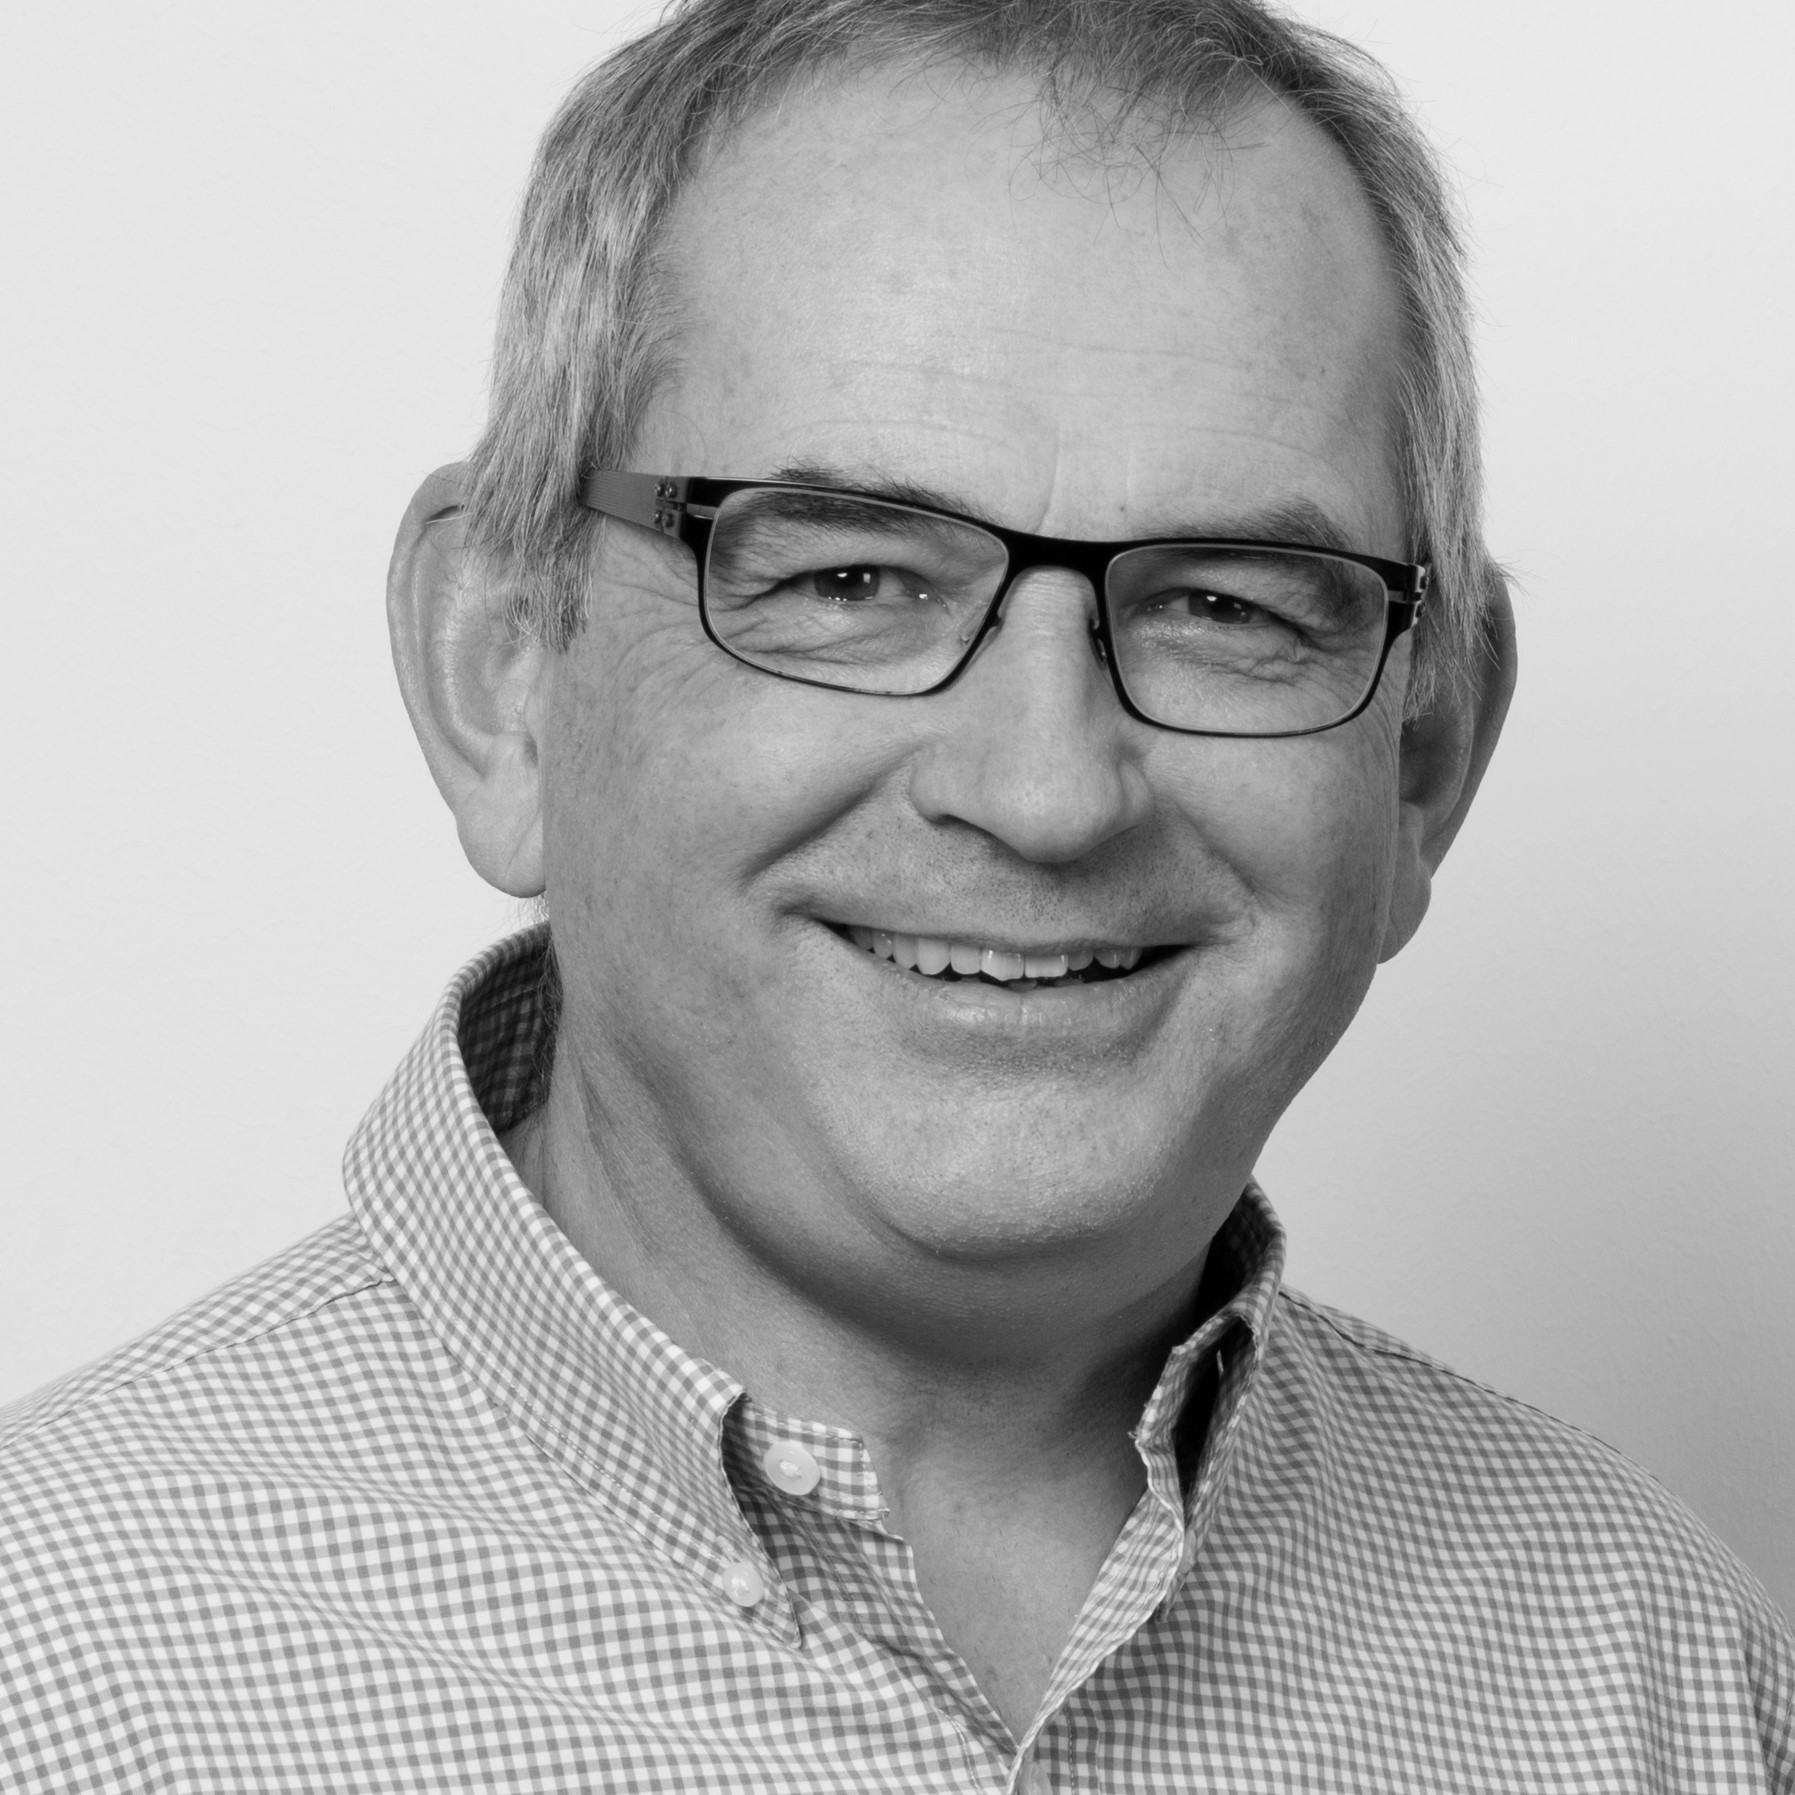 Peter Stämpfli - Entrepreneur, Stämpfli SA Berne